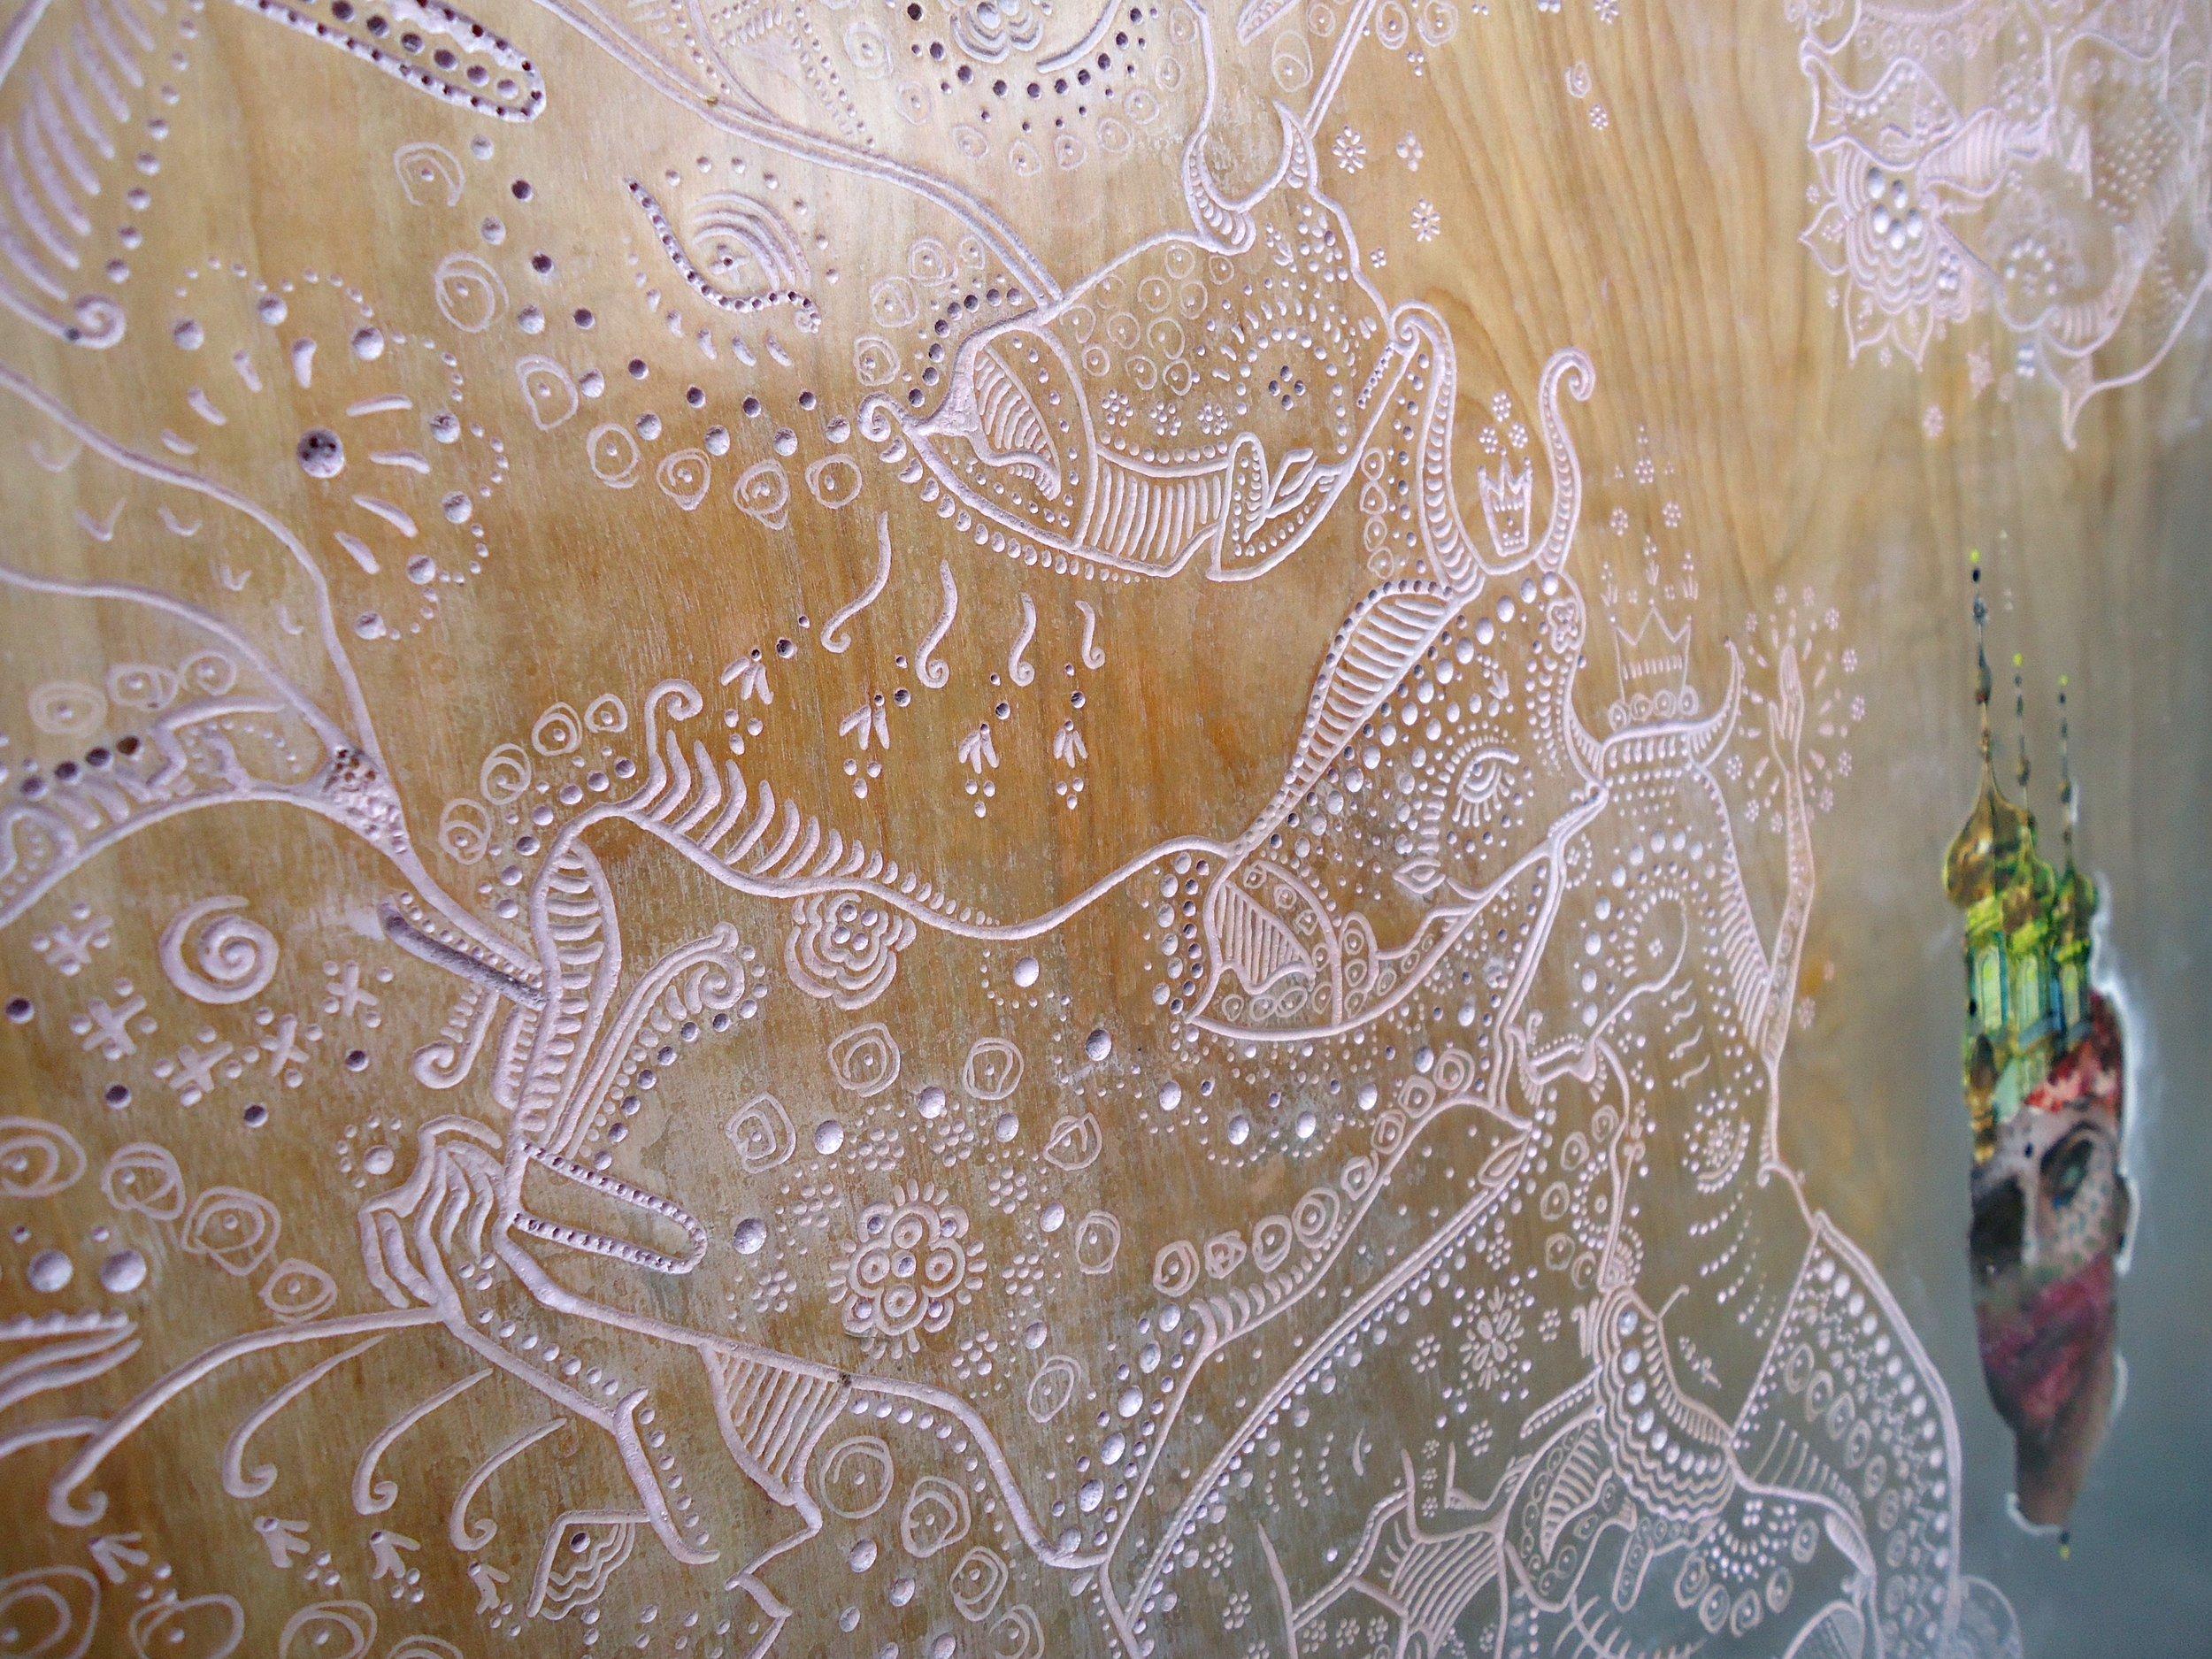 surreal-painting-carving-jason-borders.JPG